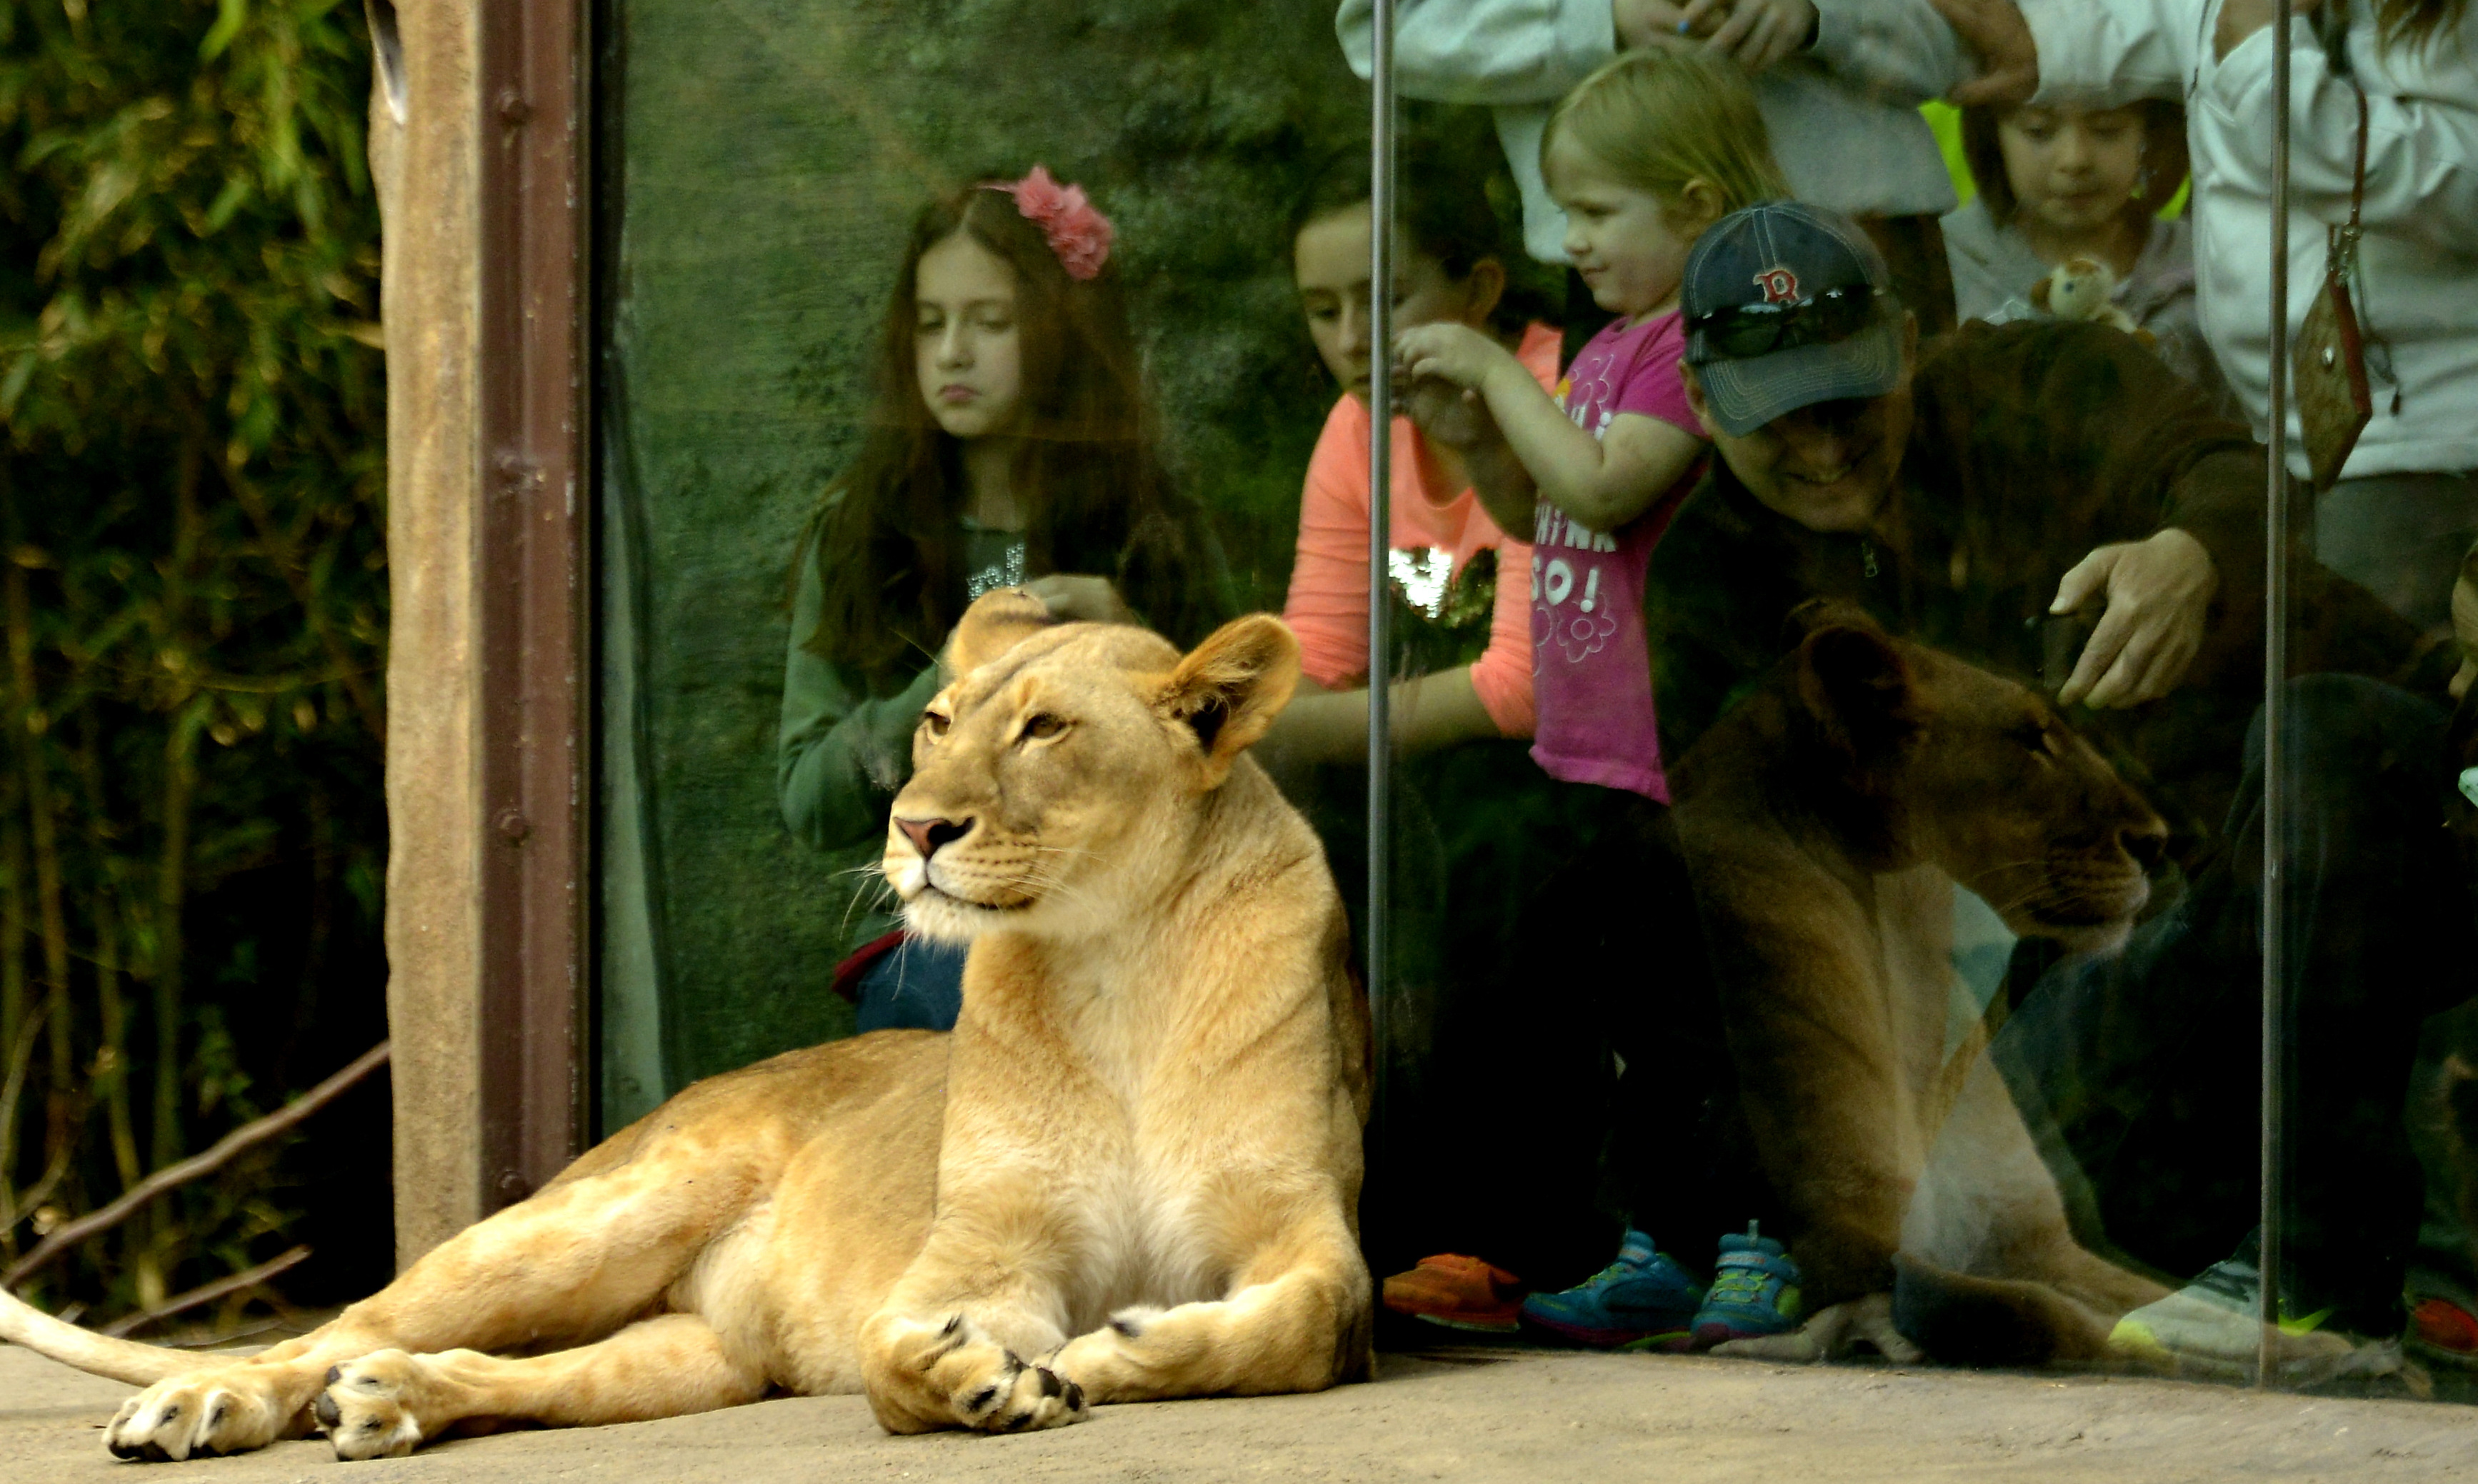 Shopping Amp Dining The Cincinnati Zoo Amp Botanical Garden